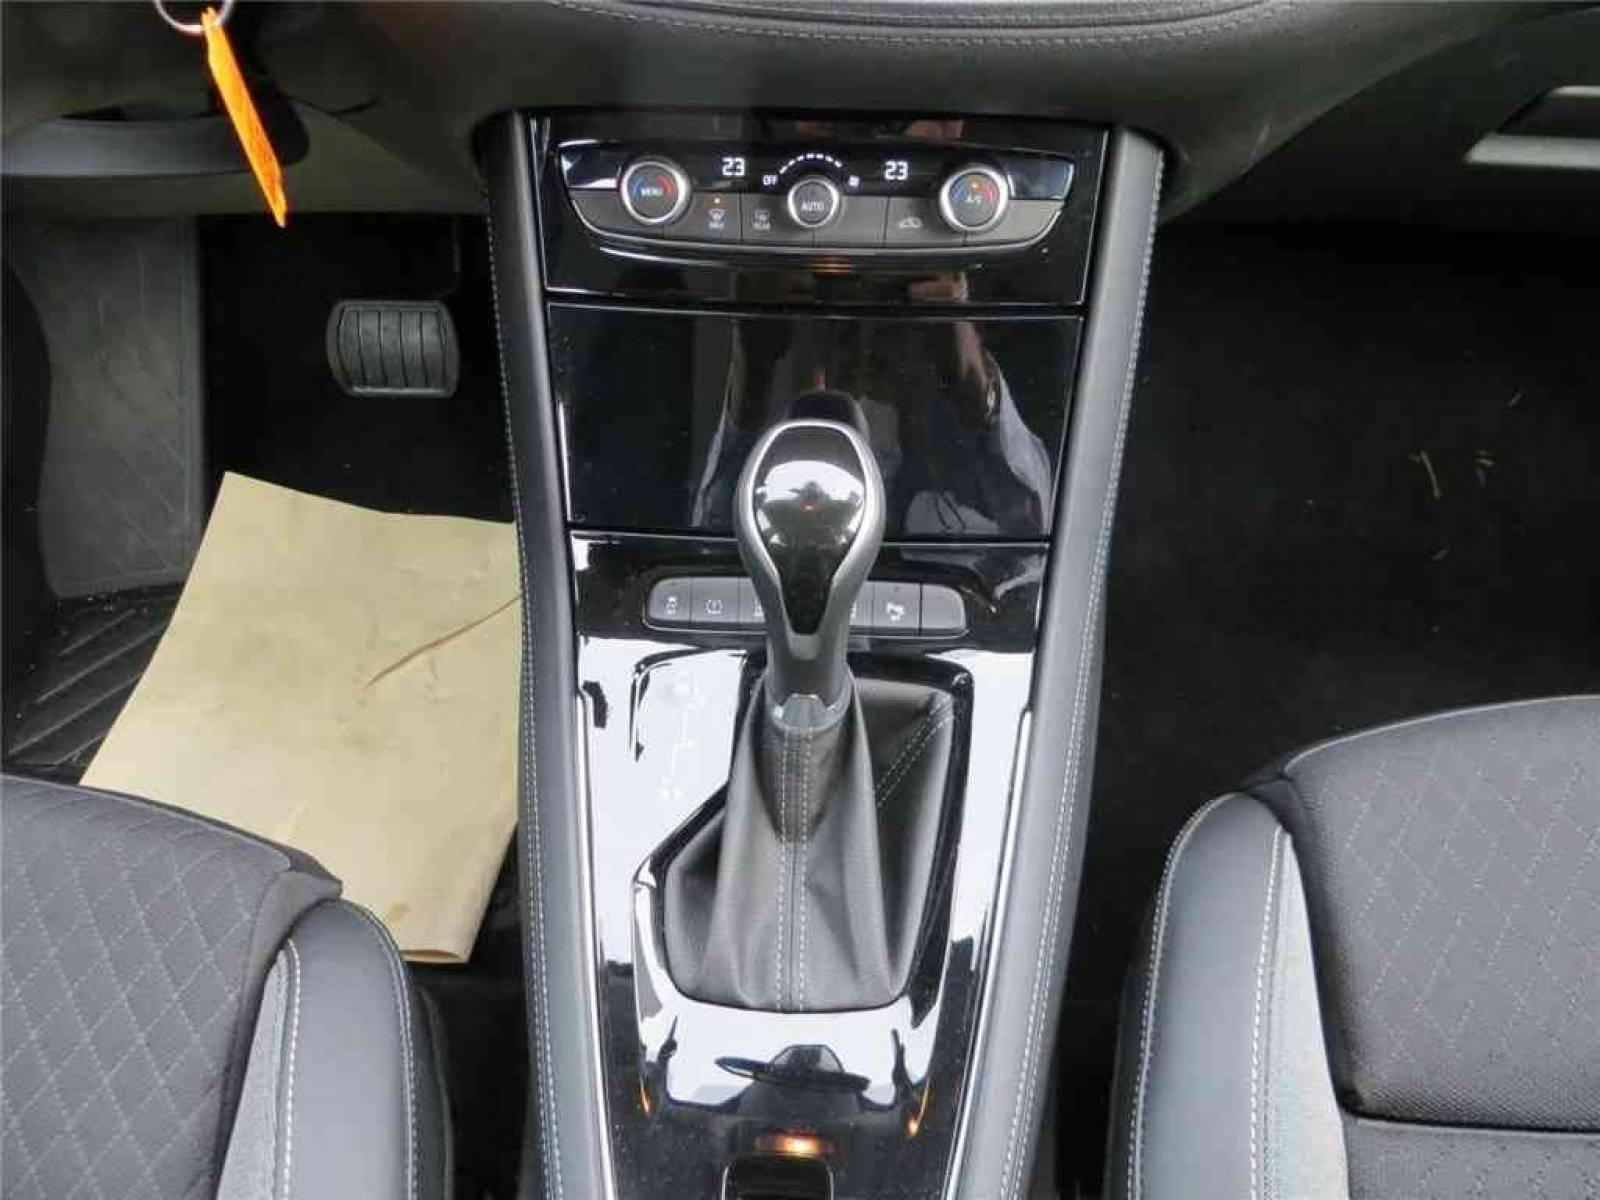 OPEL Grandland X 1.5 Diesel 130 ch BVA6 - véhicule d'occasion - Groupe Guillet - Opel Magicauto - Chalon-sur-Saône - 71380 - Saint-Marcel - 24